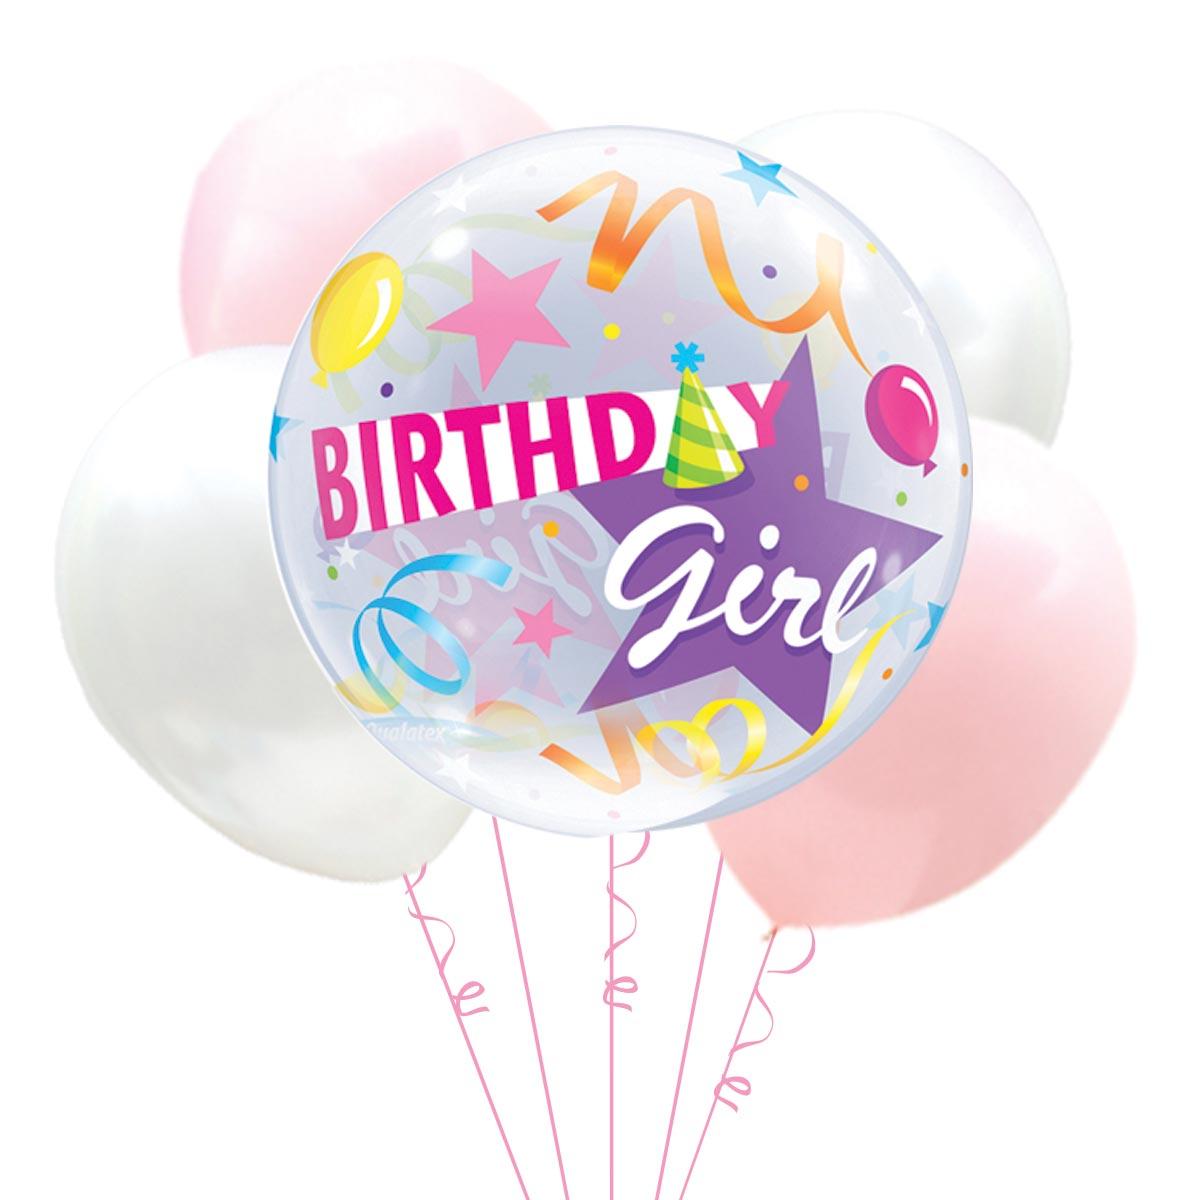 You Go, Birthday Girl!